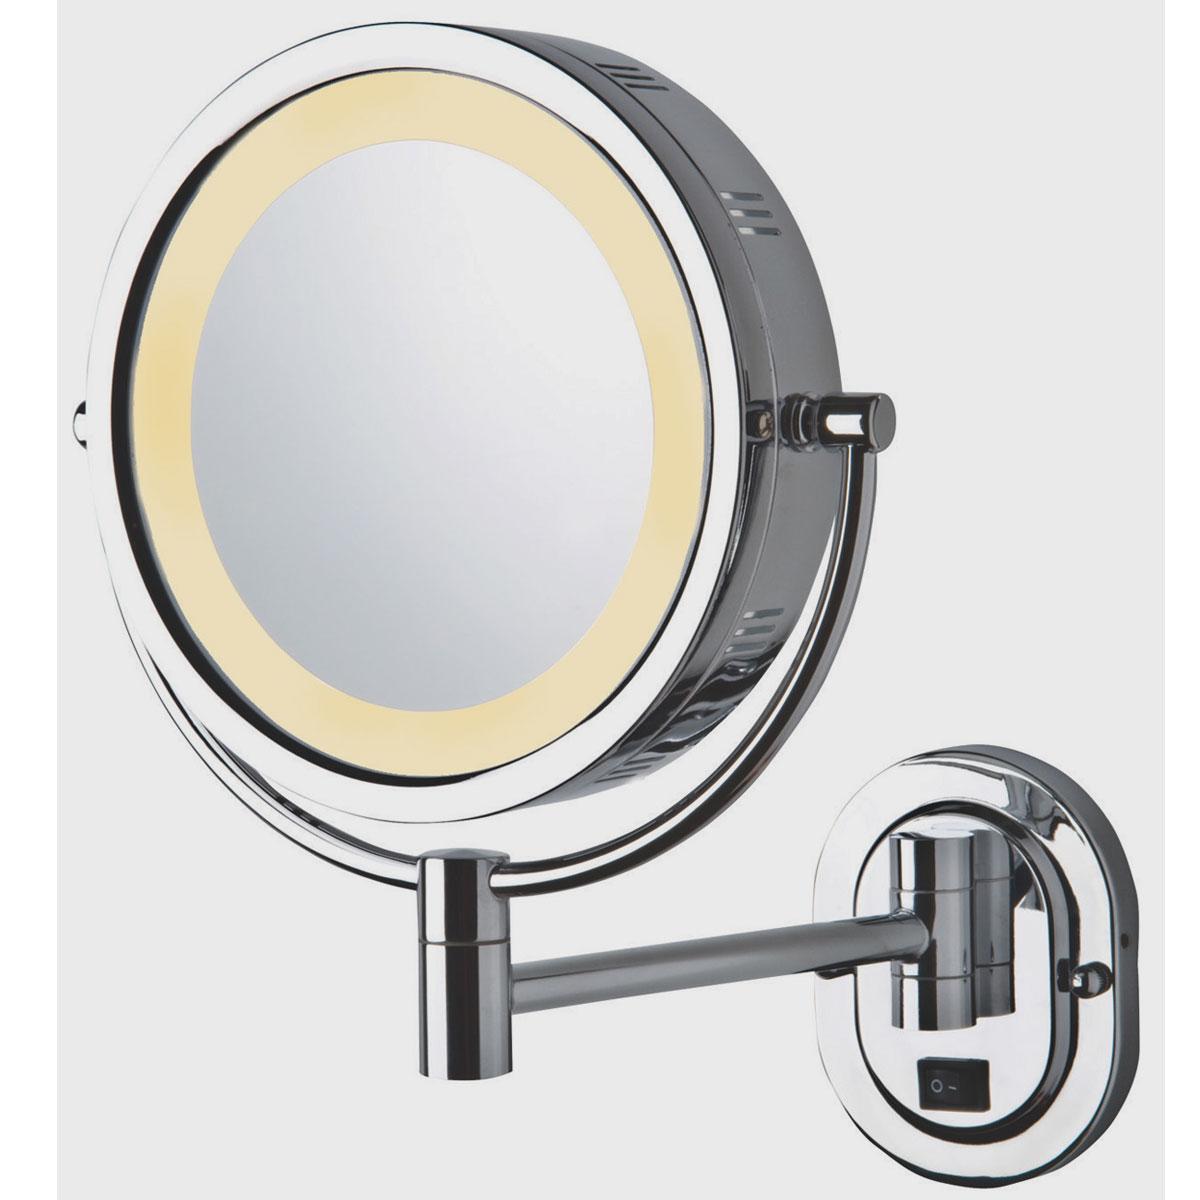 jerdon hl165cd 8 lighted wall mount mirror 1x 3x. Black Bedroom Furniture Sets. Home Design Ideas